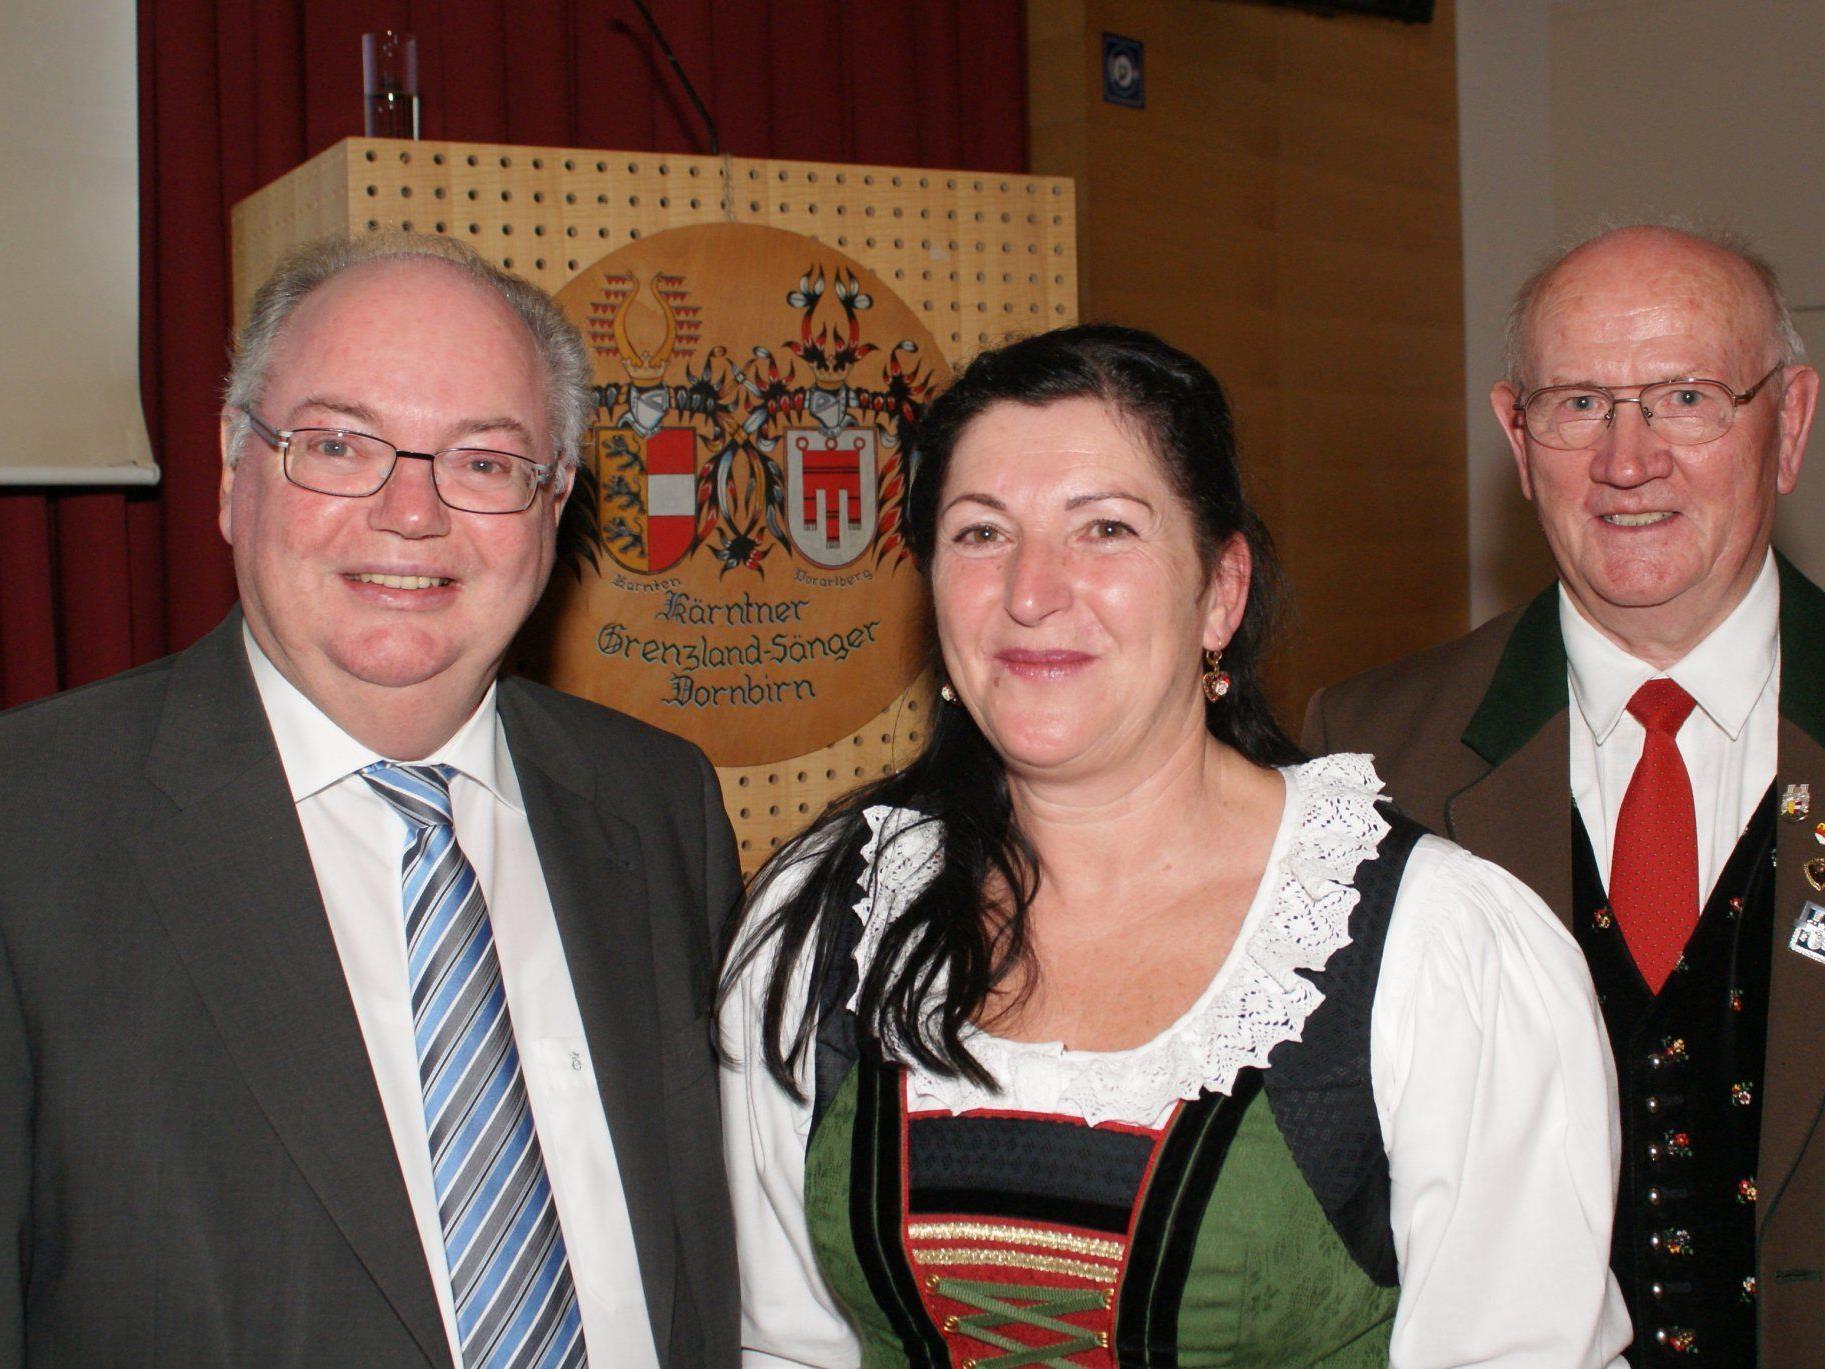 Bürgermeister DI Wolfgang Rümmele, Obfrau Margit Halbeisen und EO Fritz Schabus